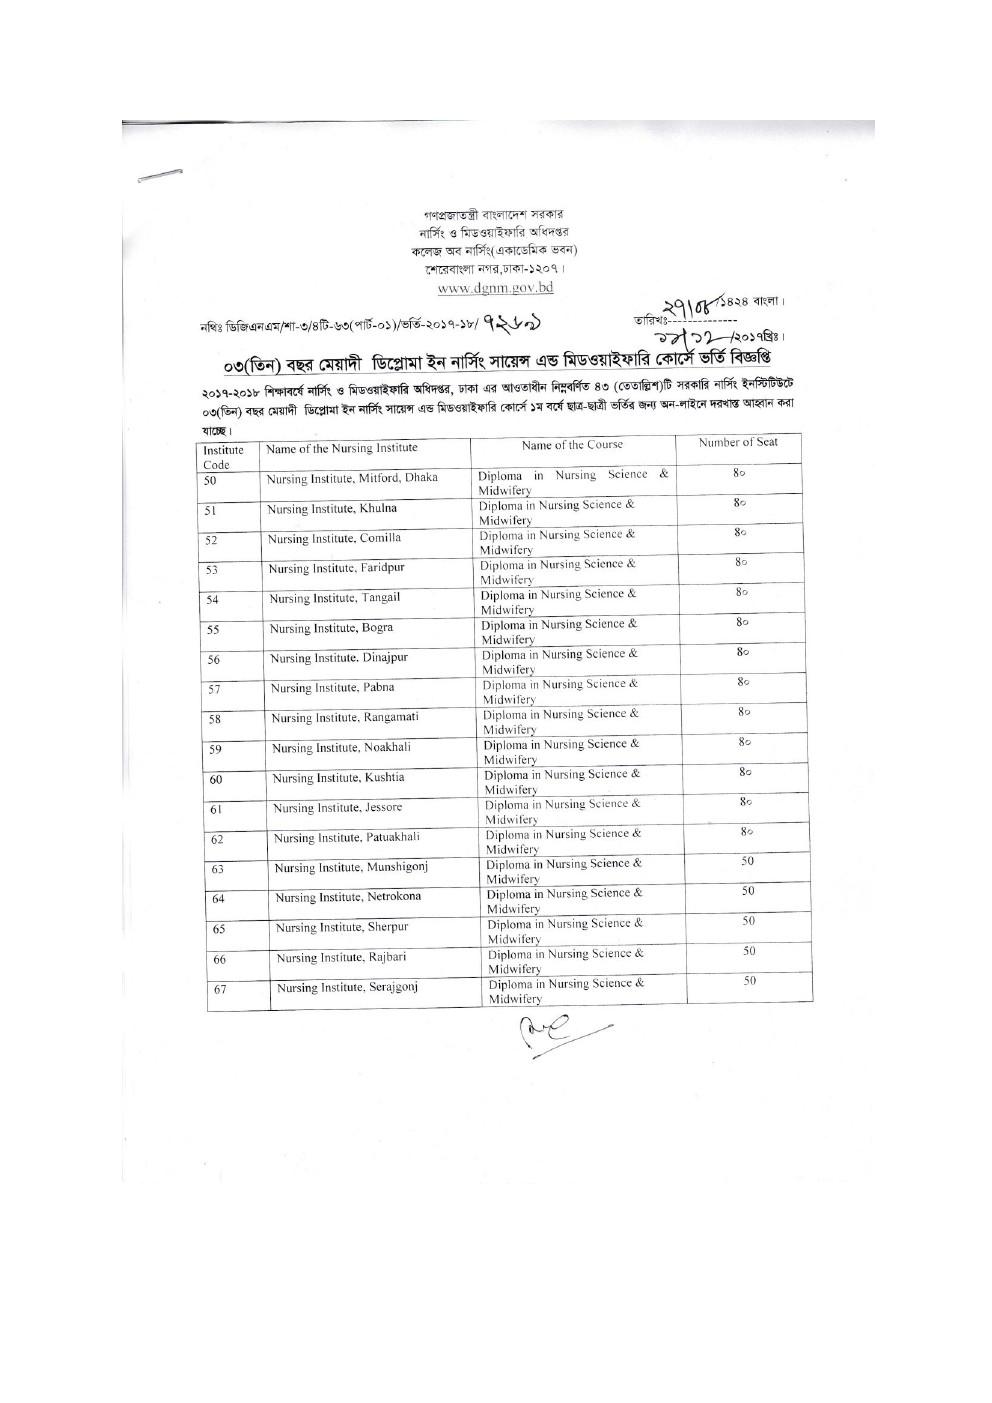 Diploma Nursing Admission Circular 2019-20 All Notice